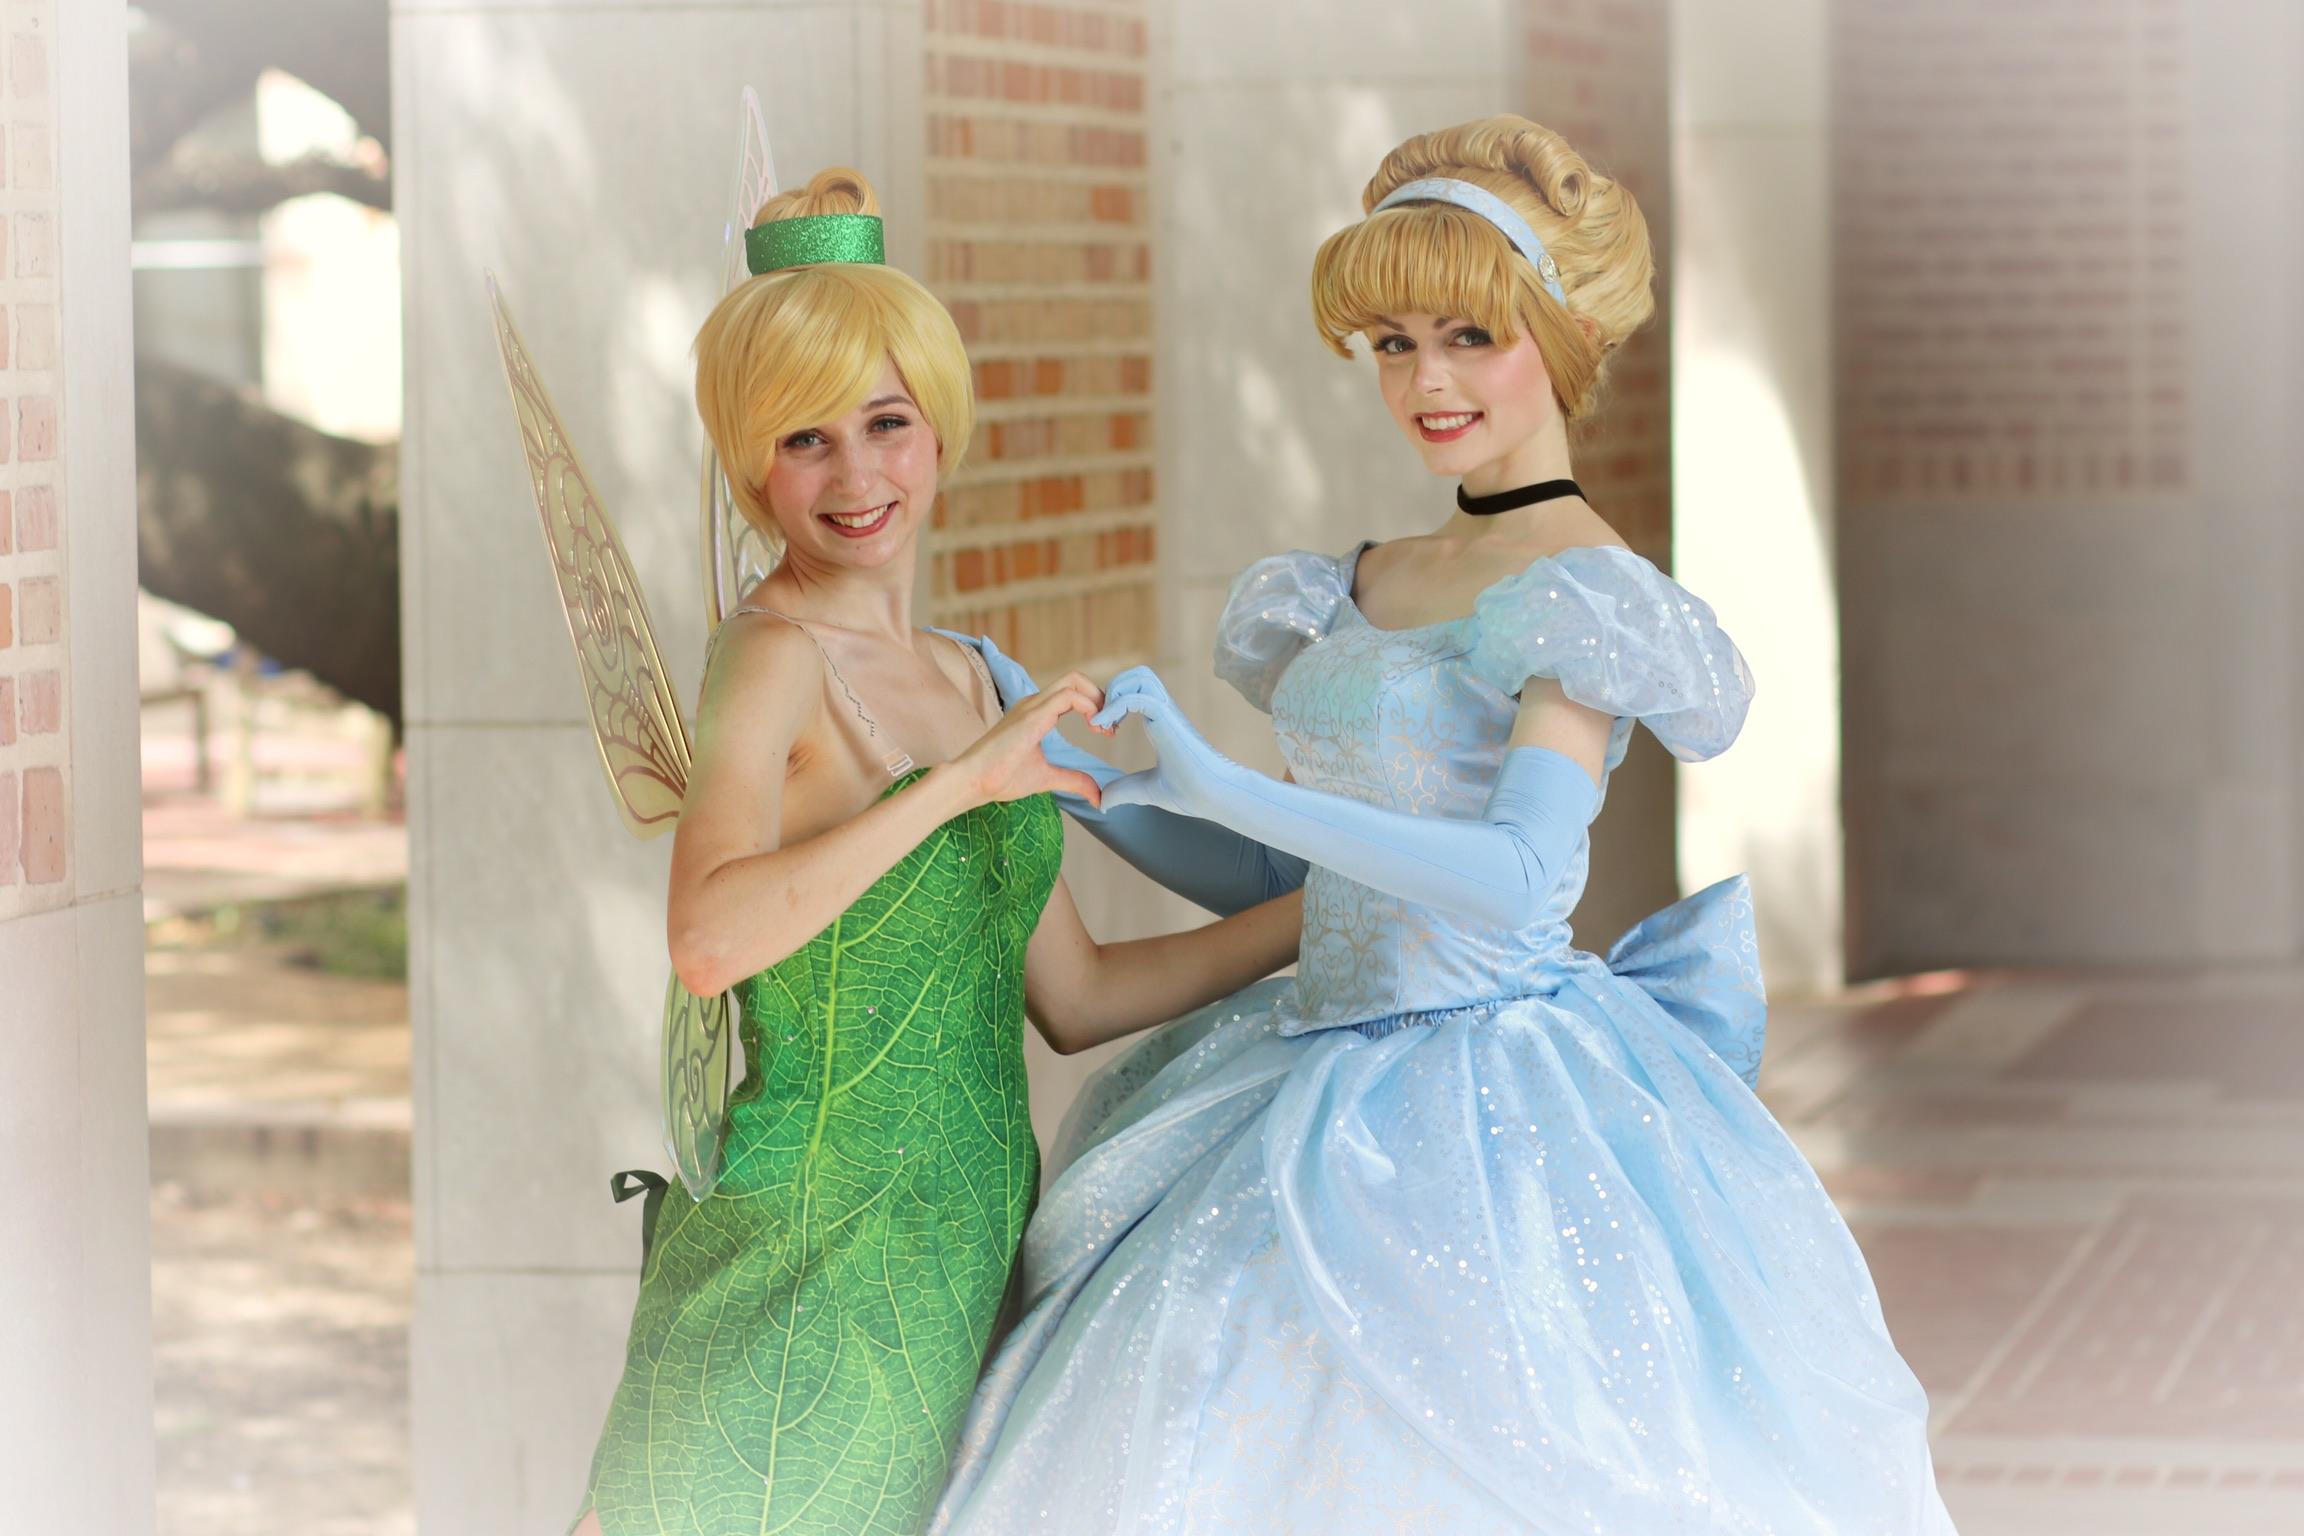 PrincessFriends